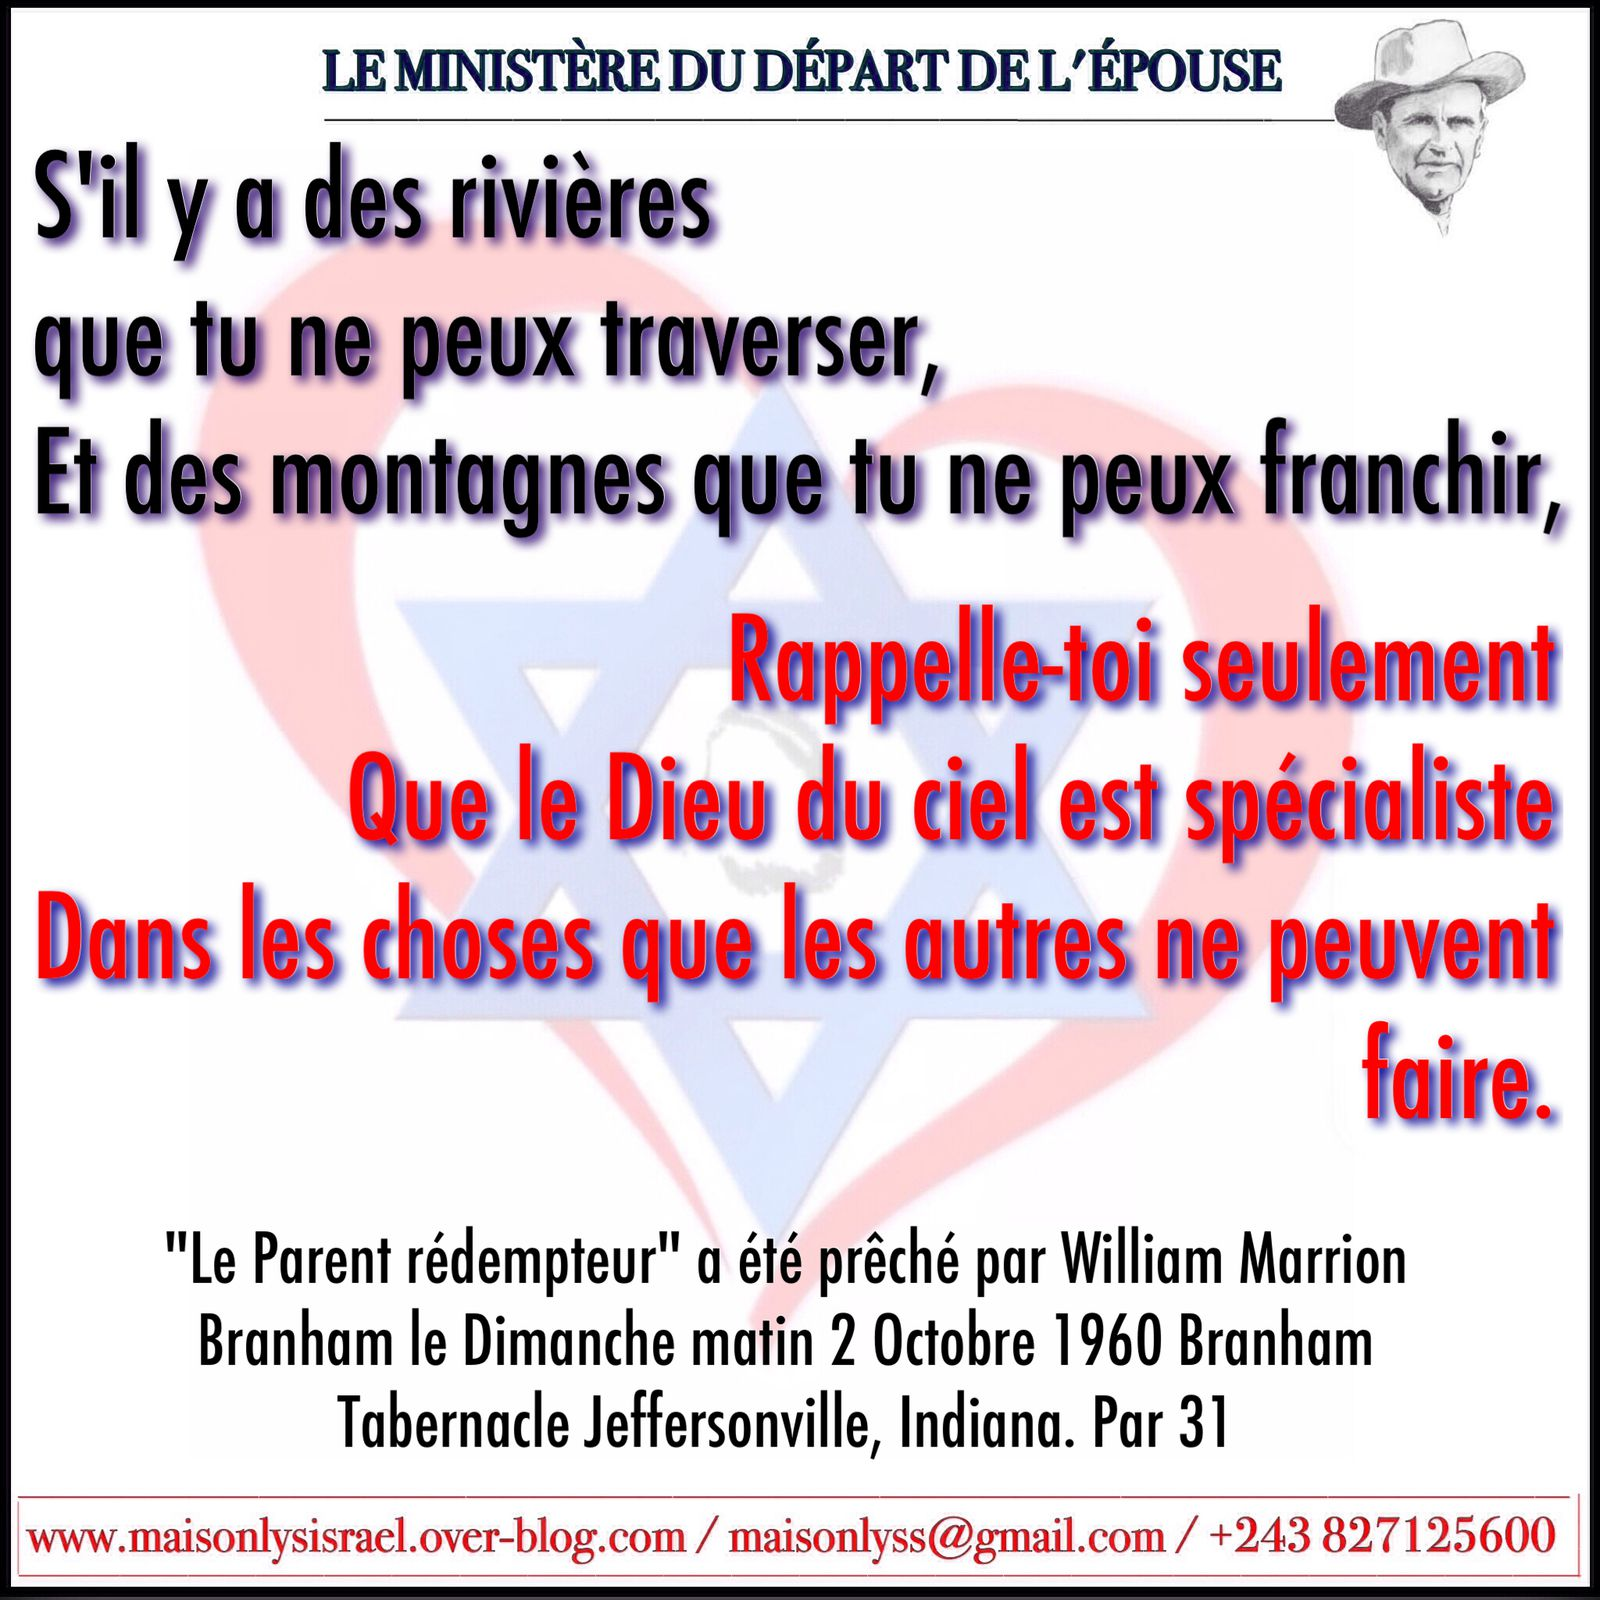 LES CITATIONS DU PROPHETE WILLIAM MARRION BRANHAM EN IMAGE